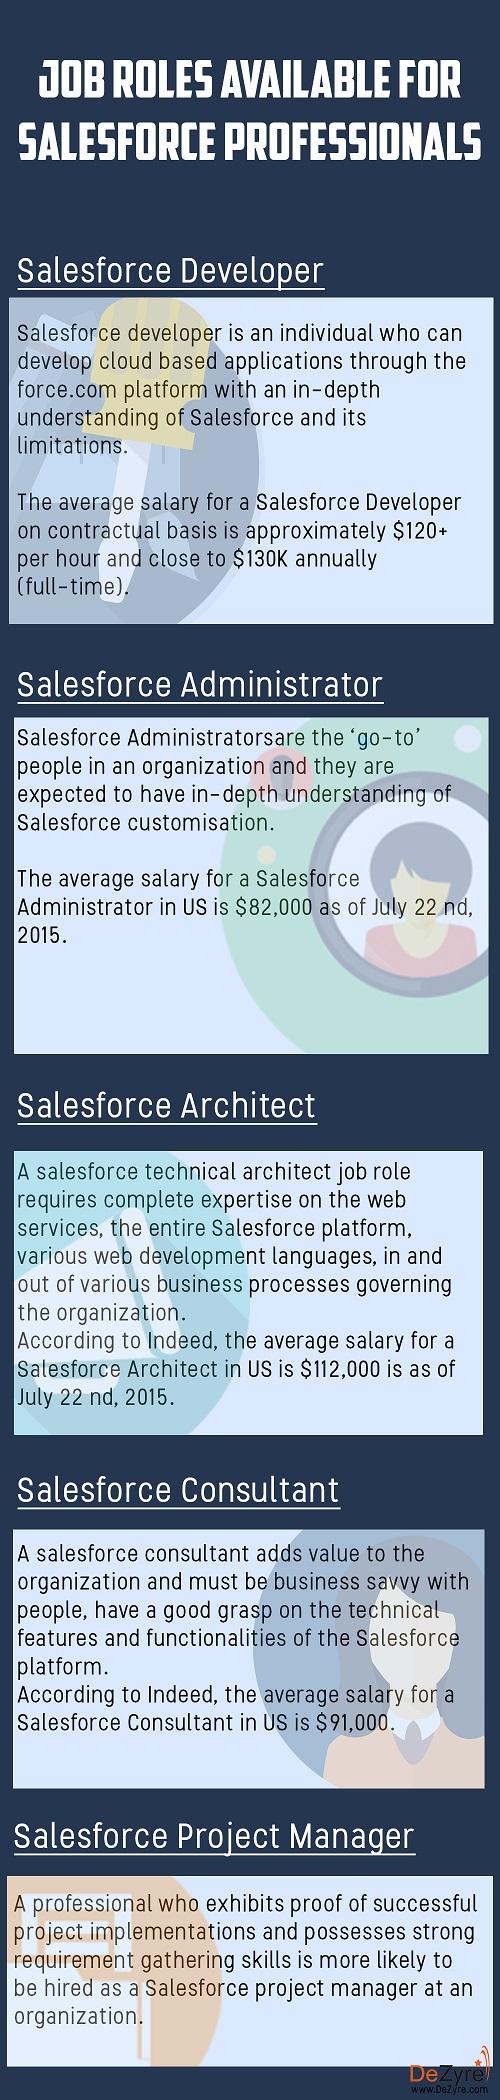 Job Roles for Salesforce Professionals